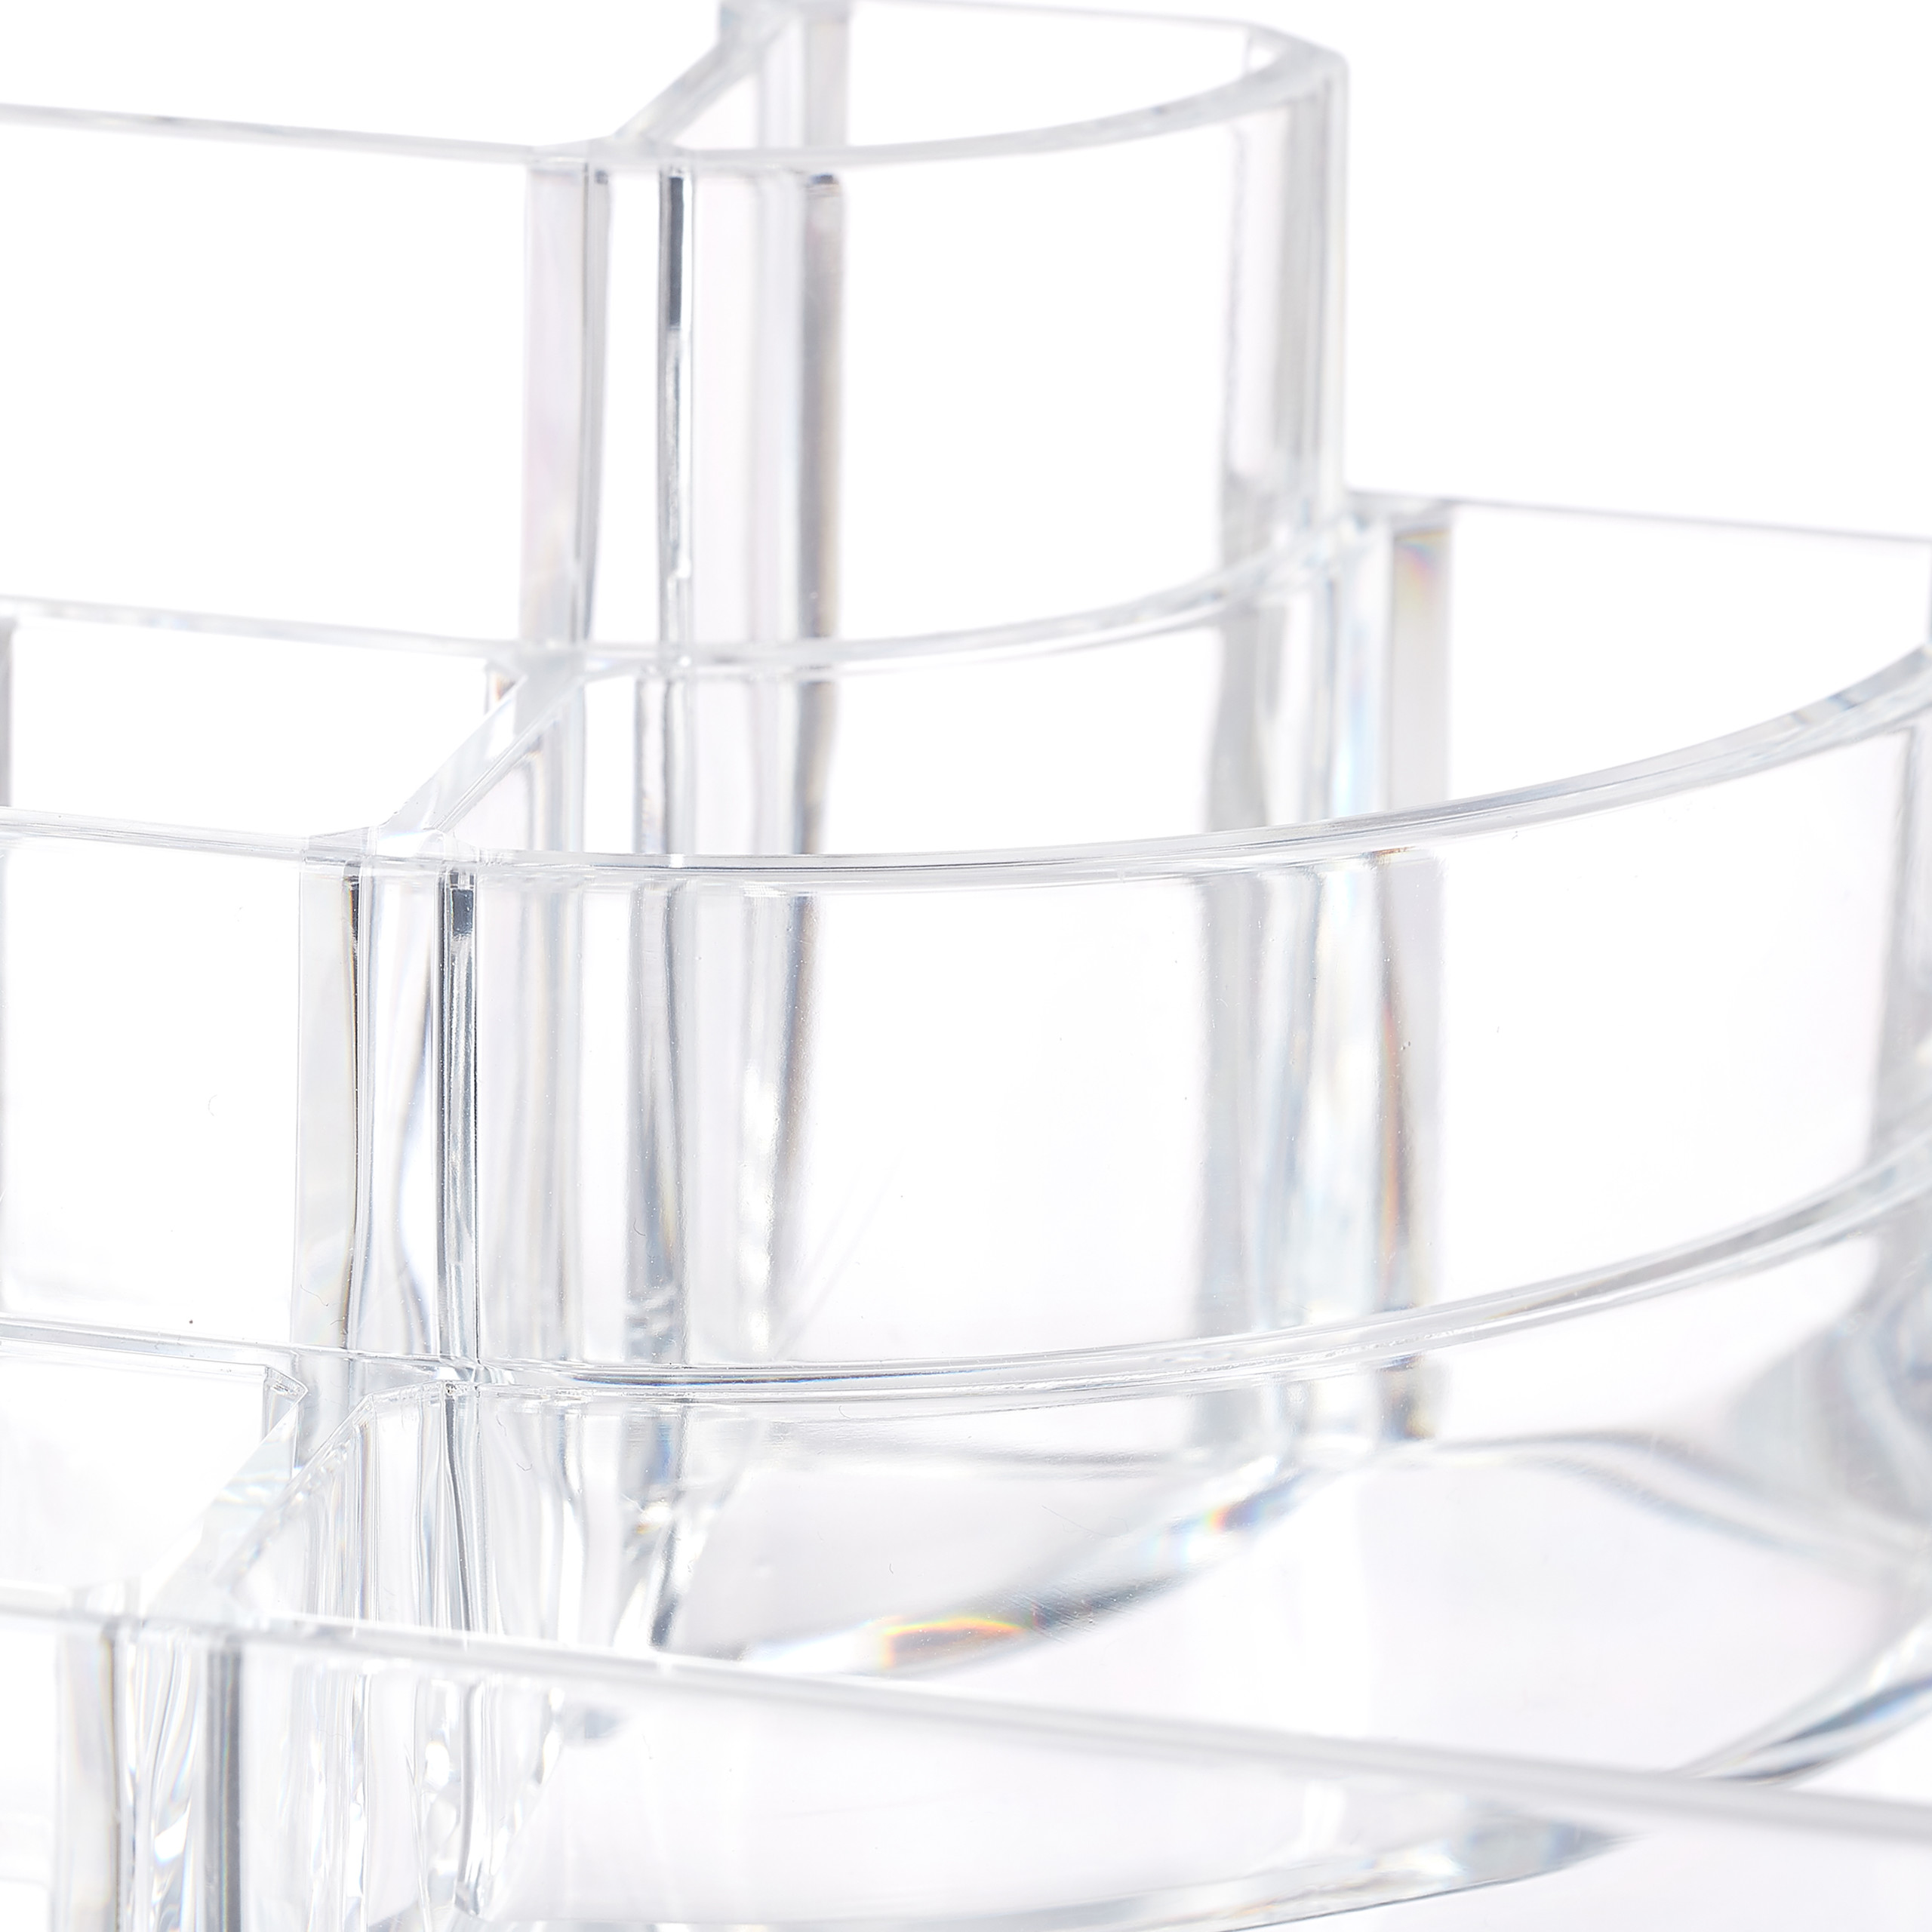 make-up-organizer-acryl-8-vakken-lippenstifthouder-opbergsysteem miniatuur 11